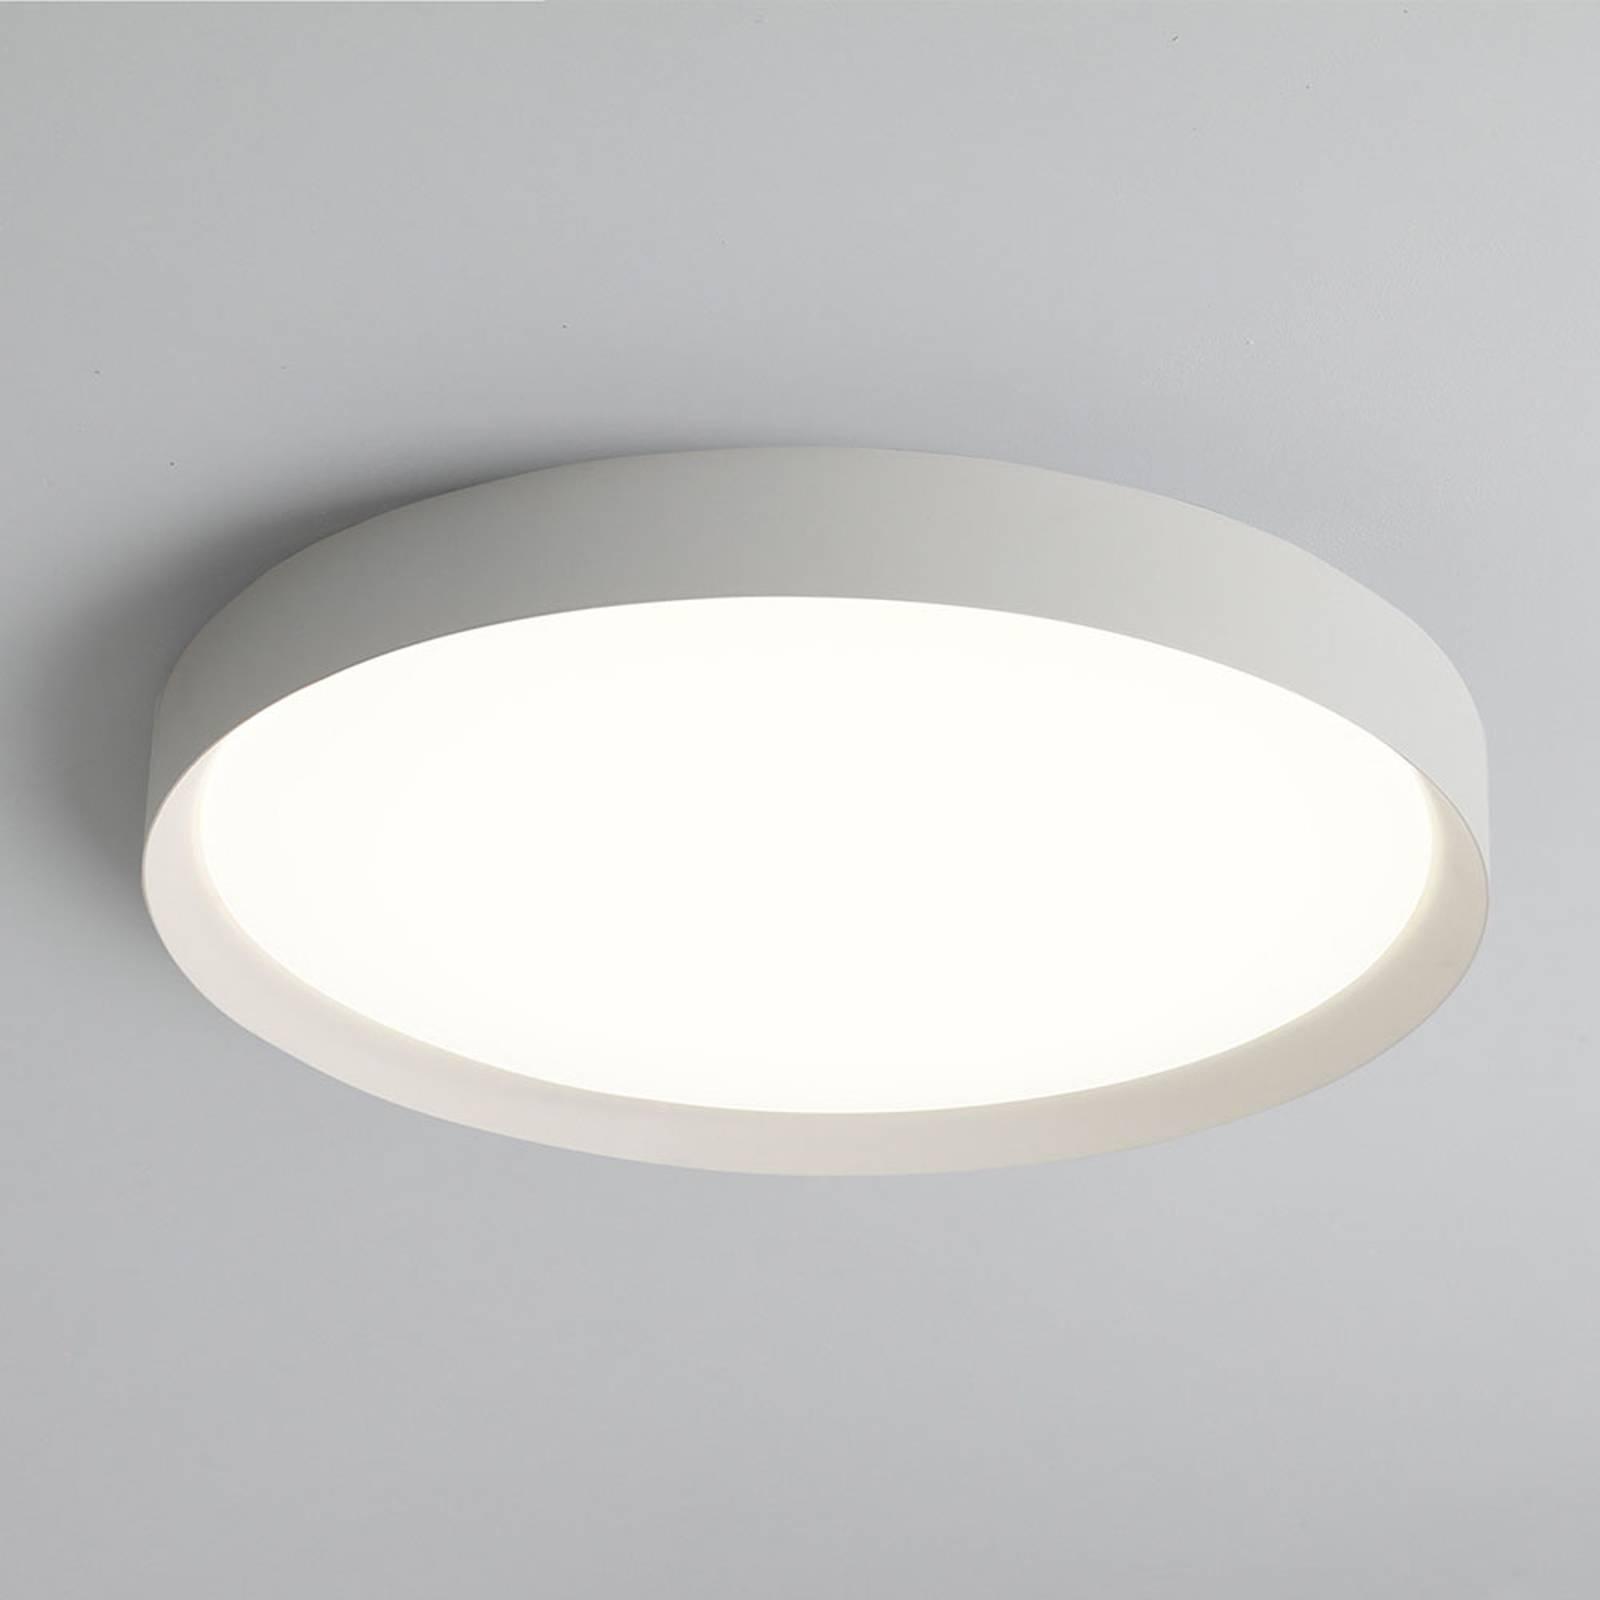 LED-kattovalaisin Minsk Ø 60 cm Casambi valkoinen